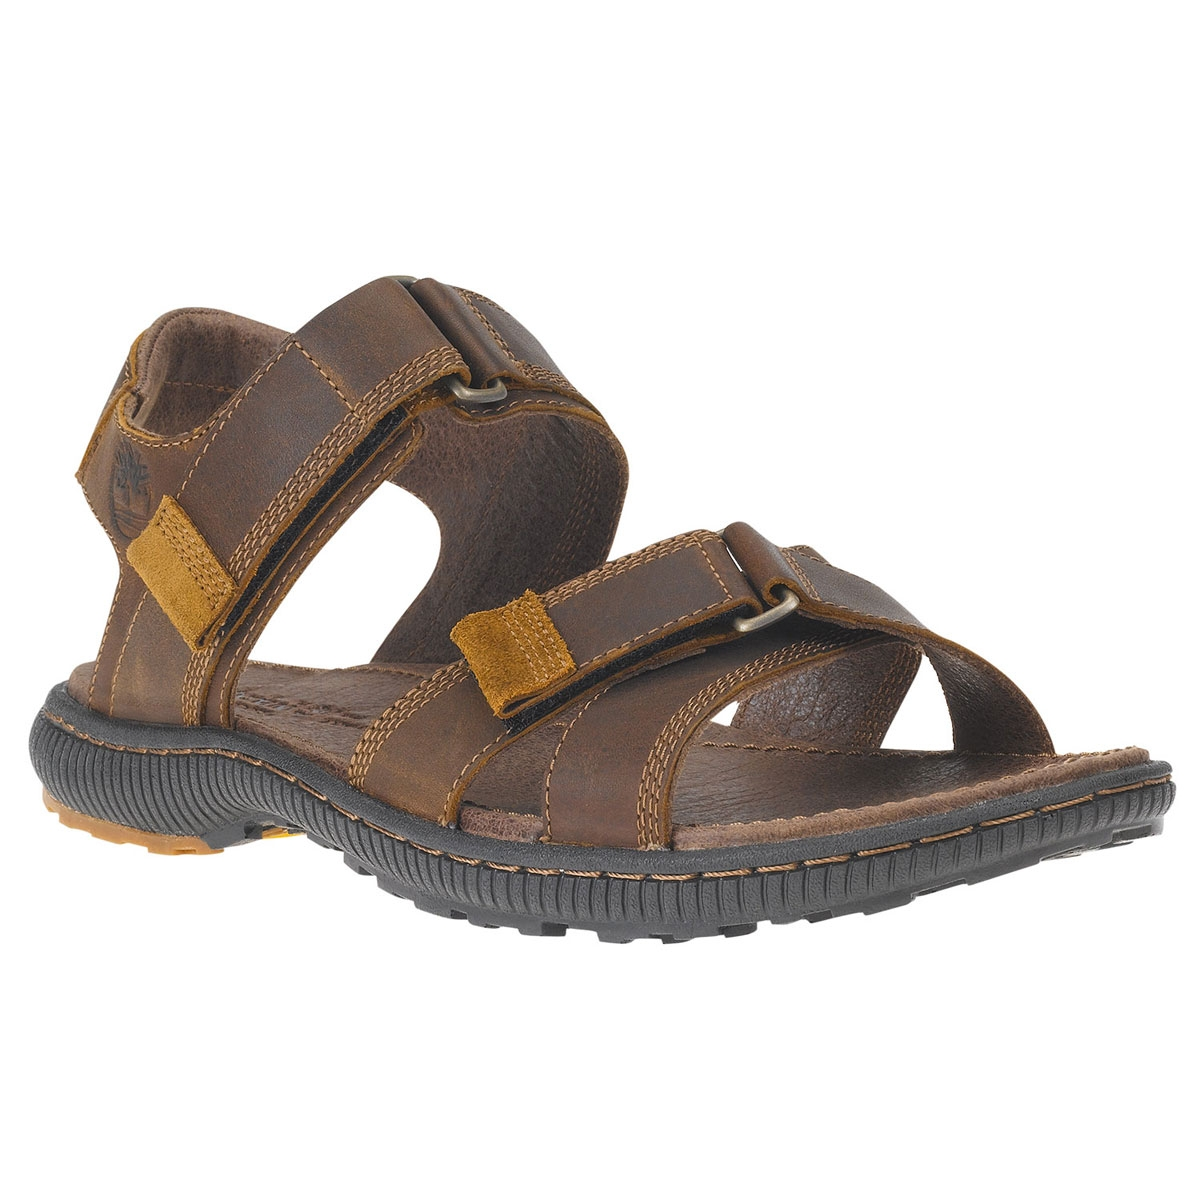 Poner Escéptico pedir disculpas  timberland sandals mens uk